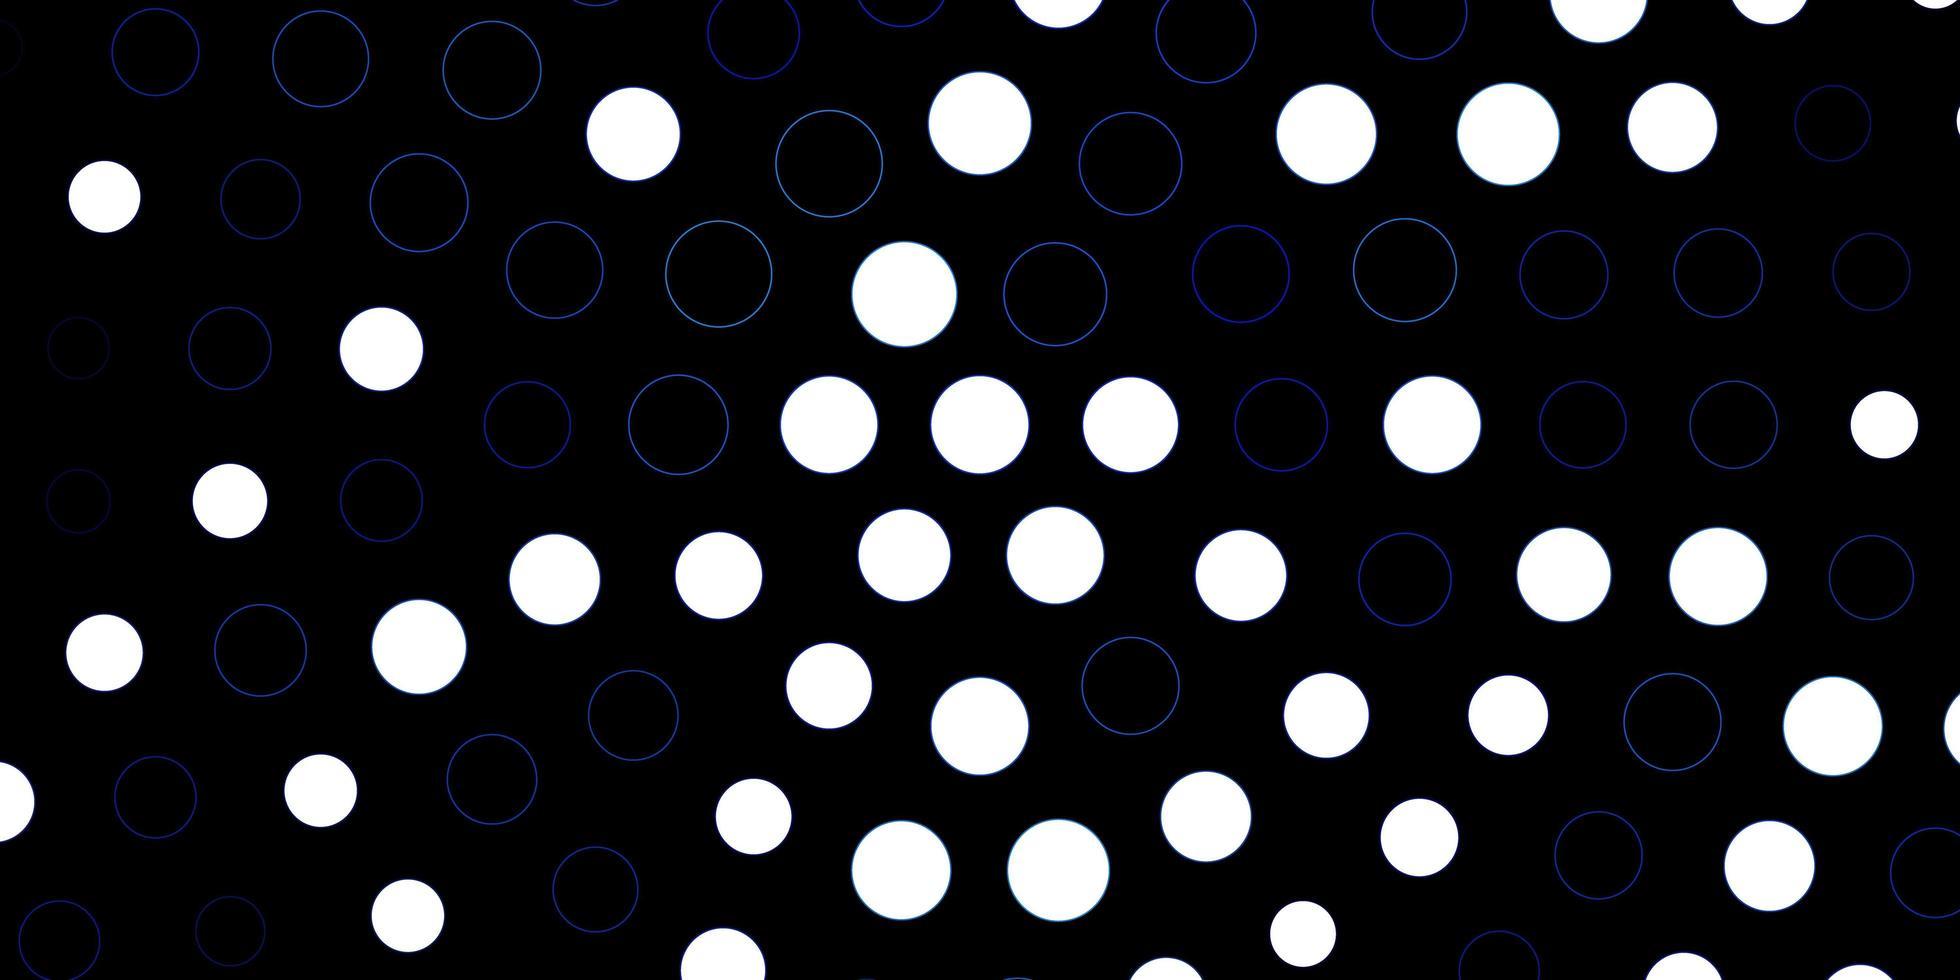 dunkelrosa, blaue Vektorschablone mit Kreisen. vektor